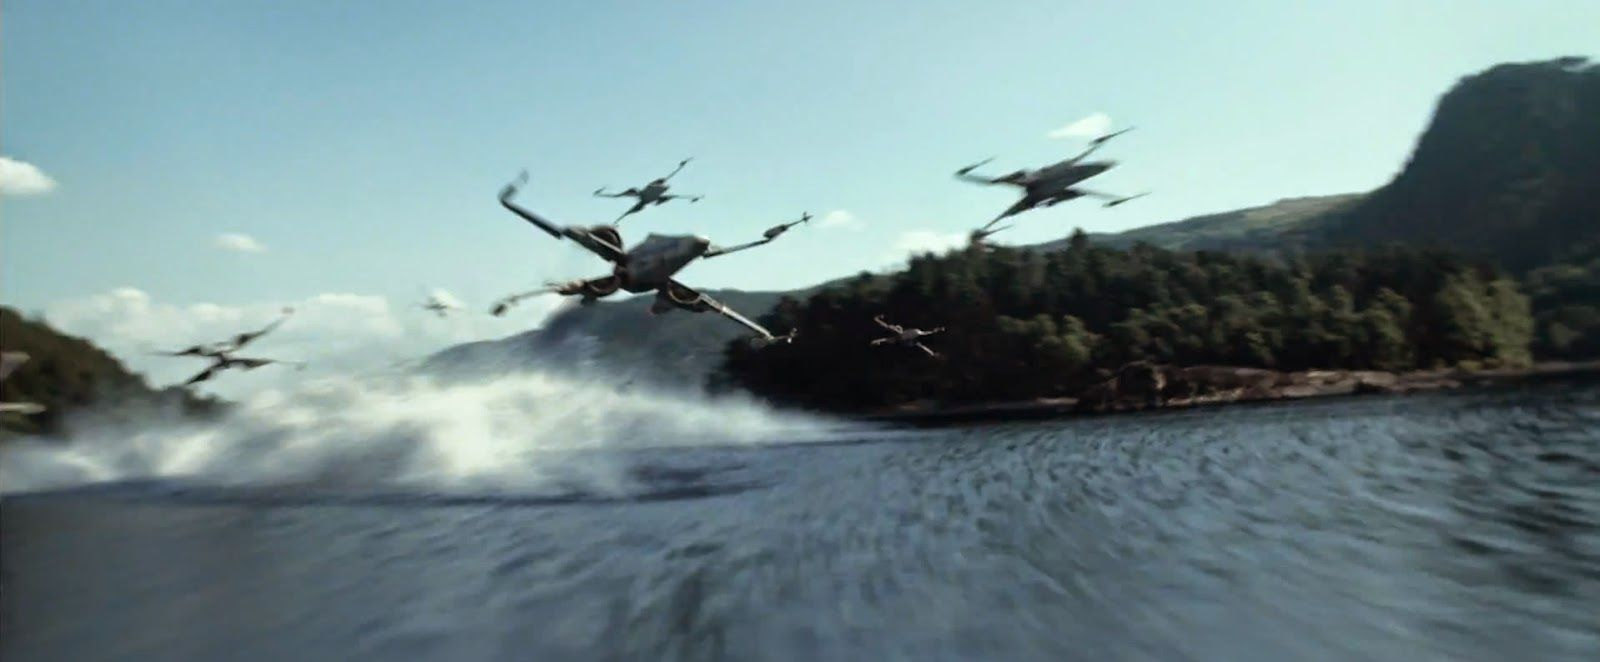 Star Wars Episode VII: The Force Awakens X Wing Still